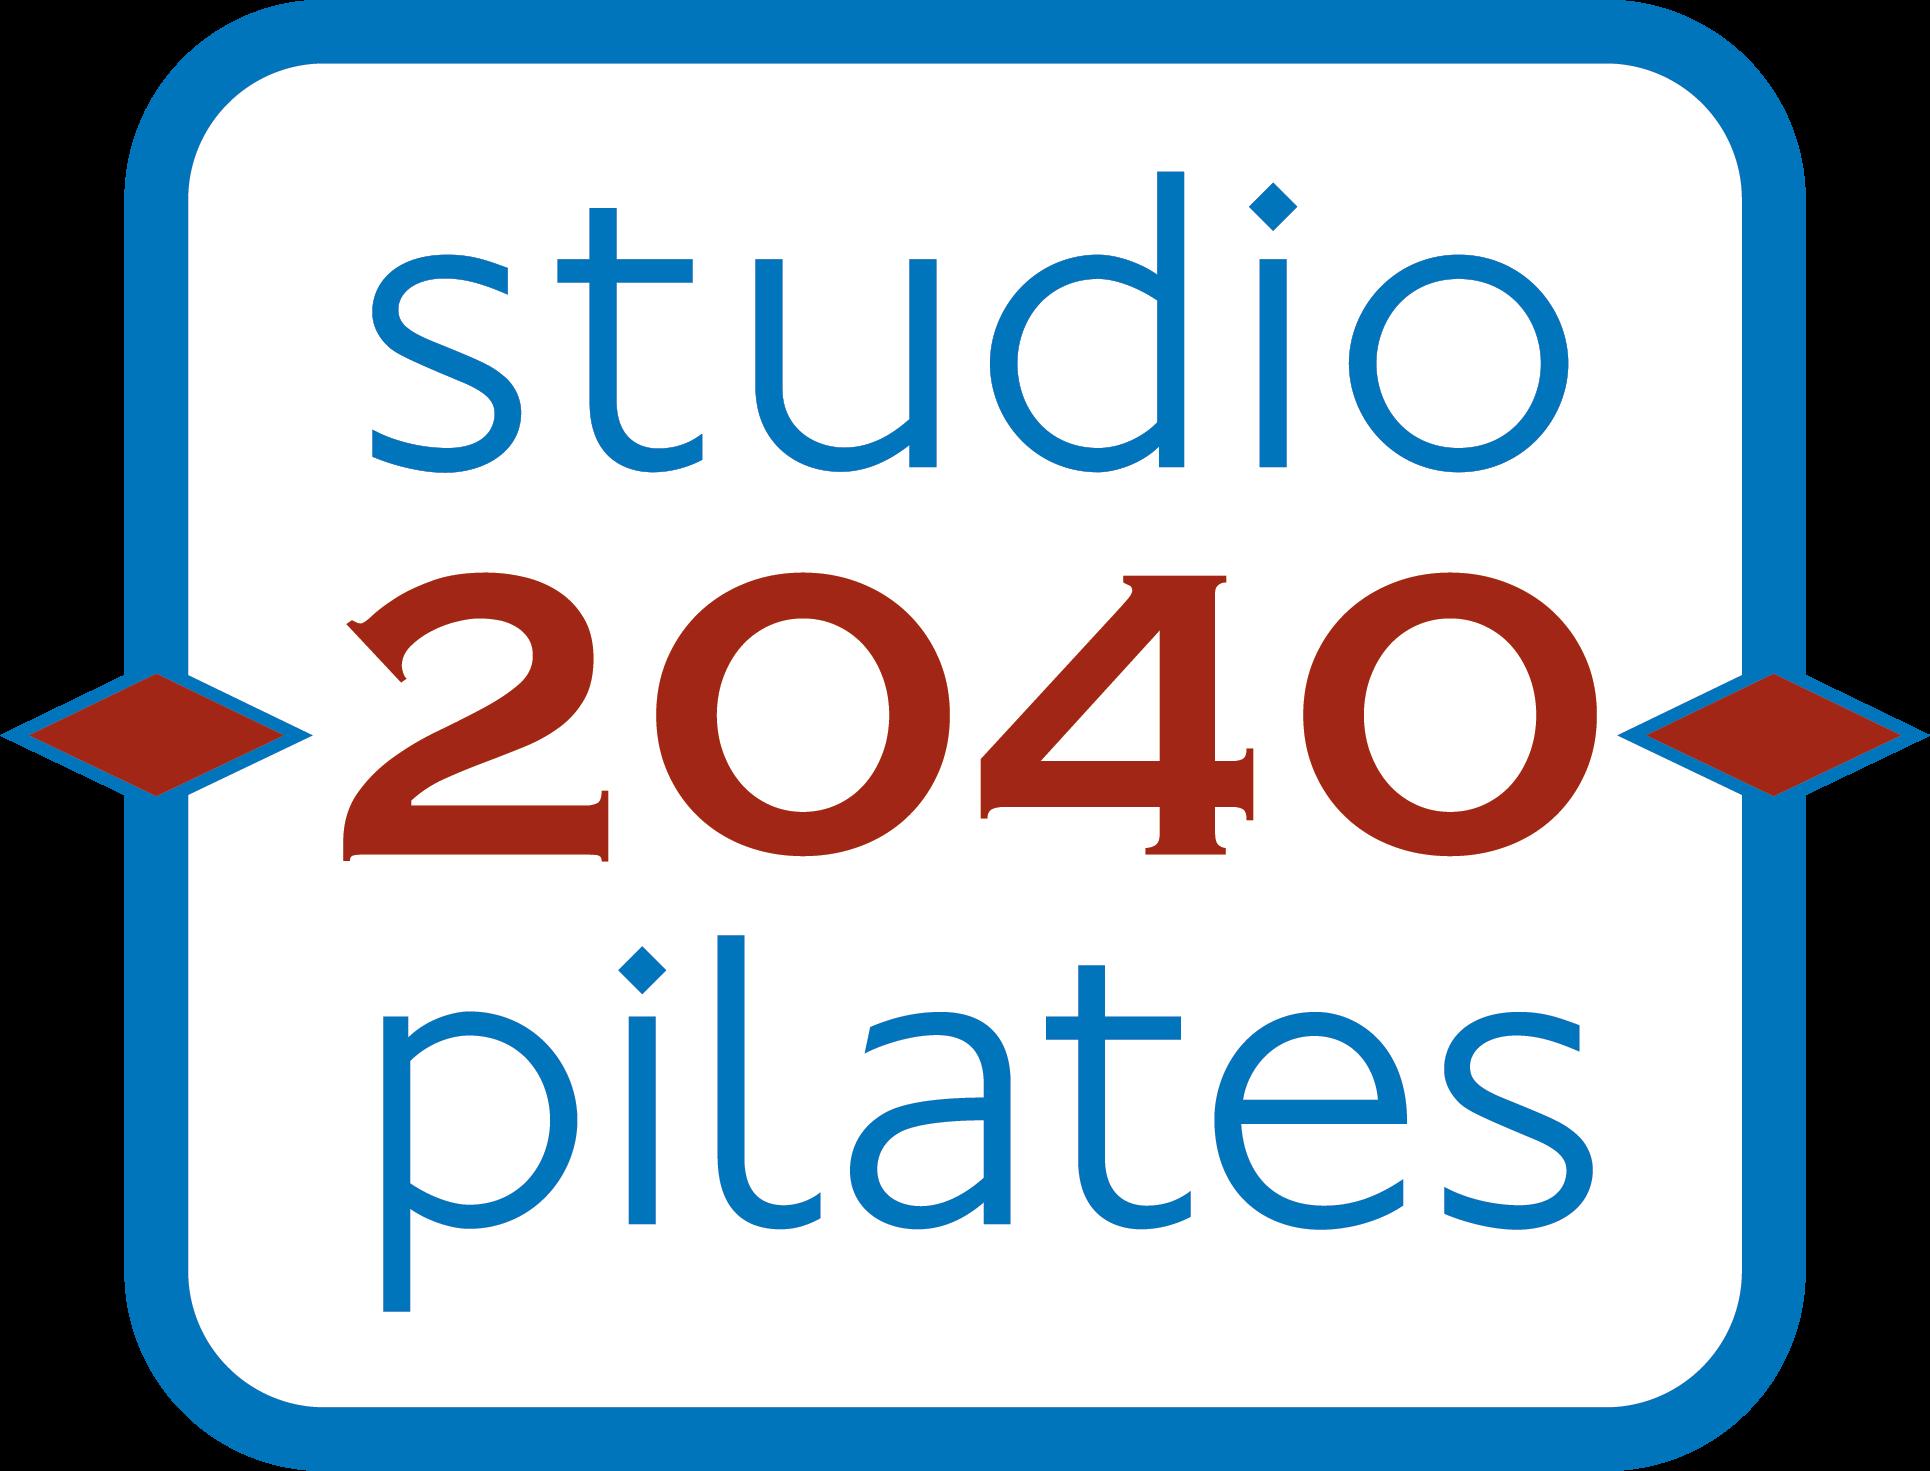 Studio_2040_Pilates.png